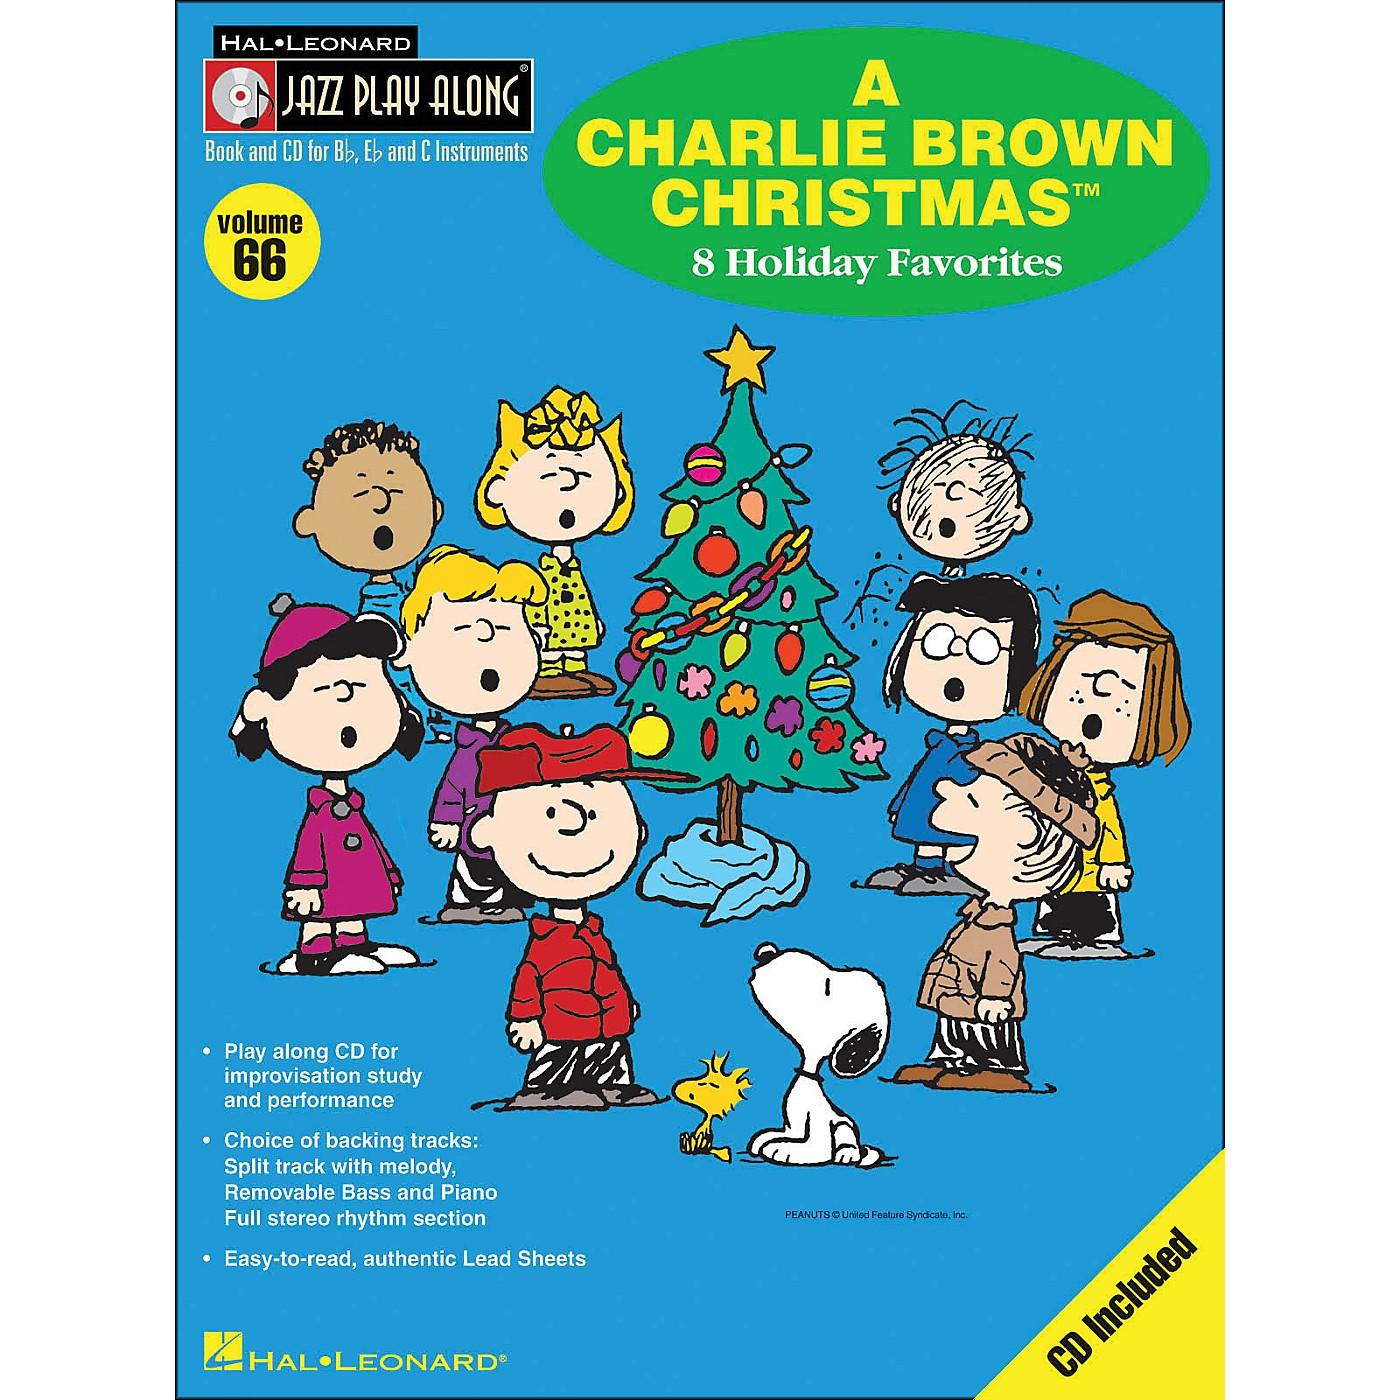 Hal Leonard A Charlie Brown Christmas - Jazz Play-Along Volume 66 BookCD thumbnail